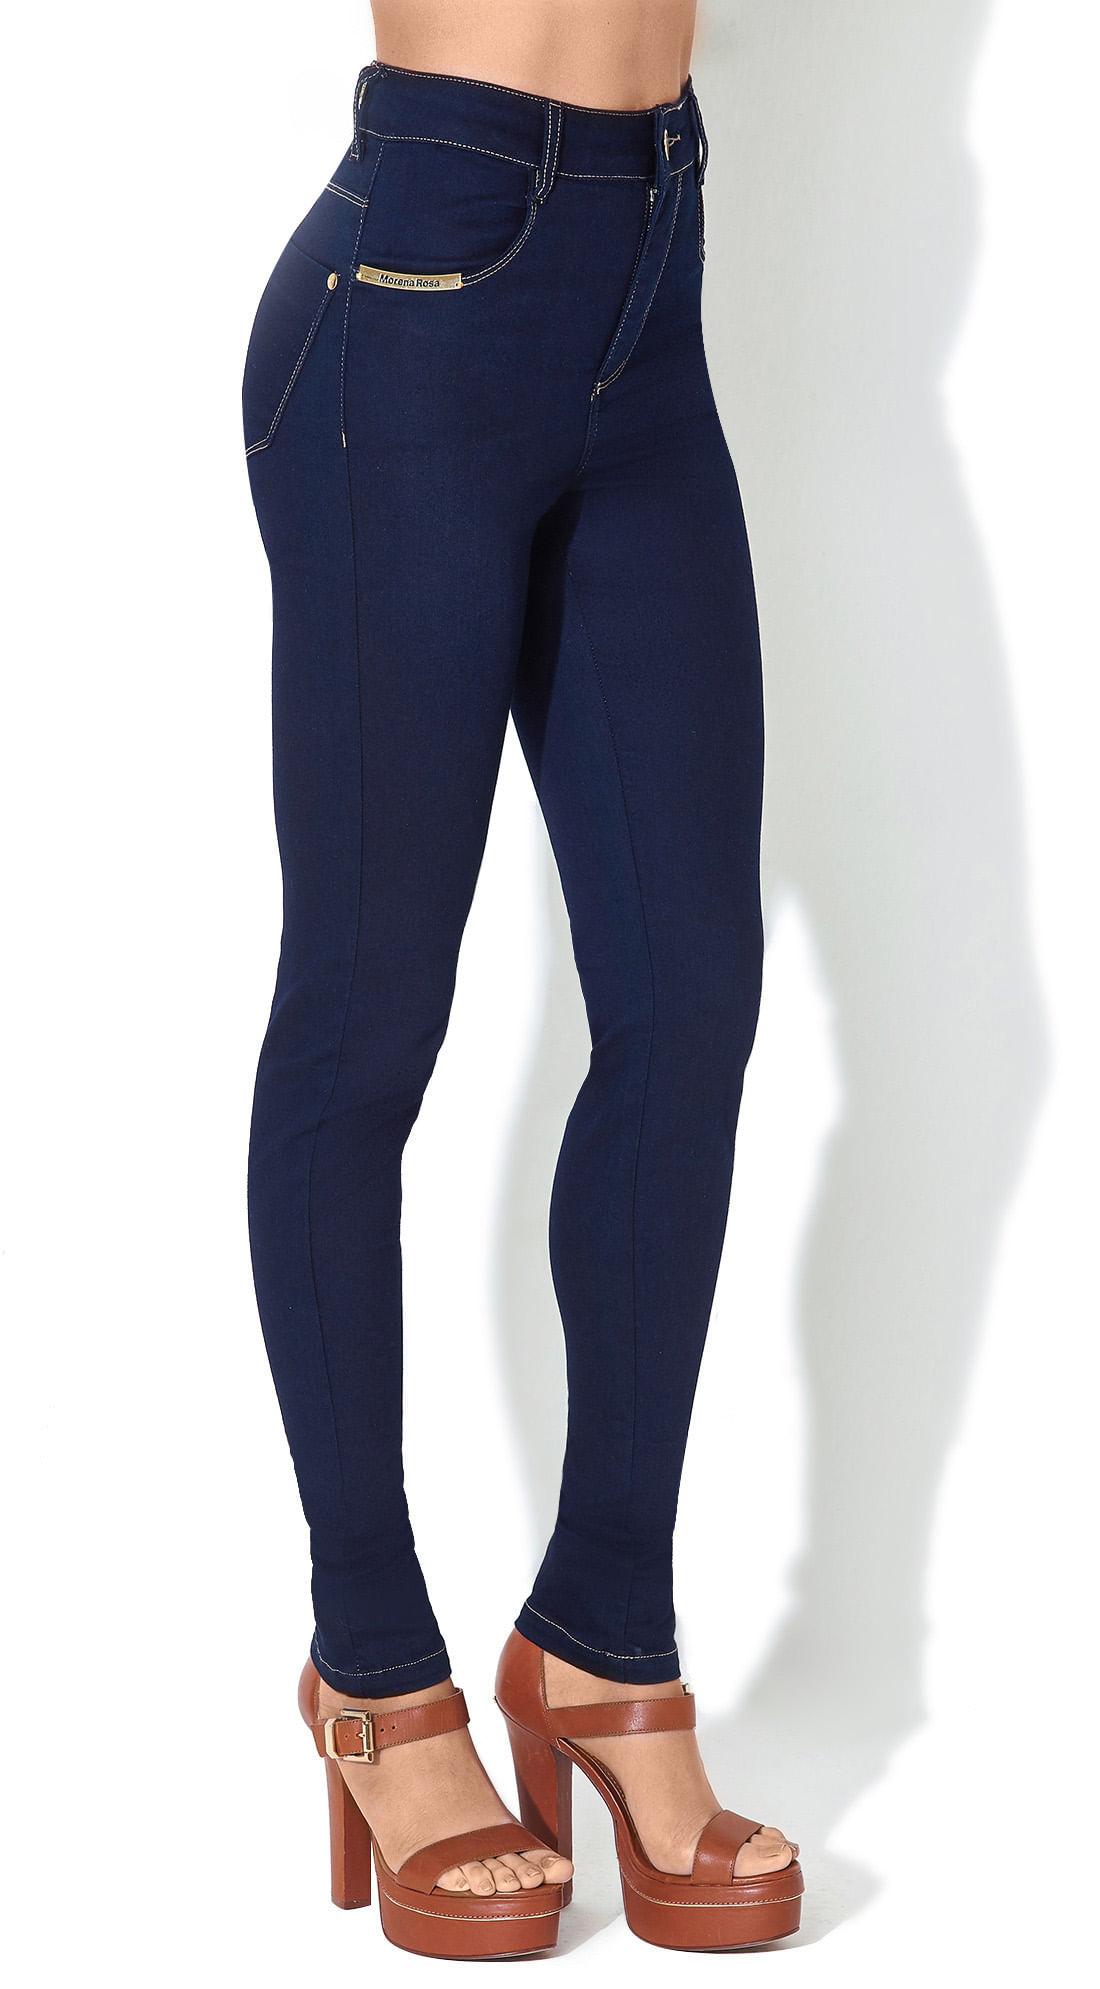 58577119a1 Calca Jeans Andreia Cos Alto Hypercurve Jeans - morenarosa